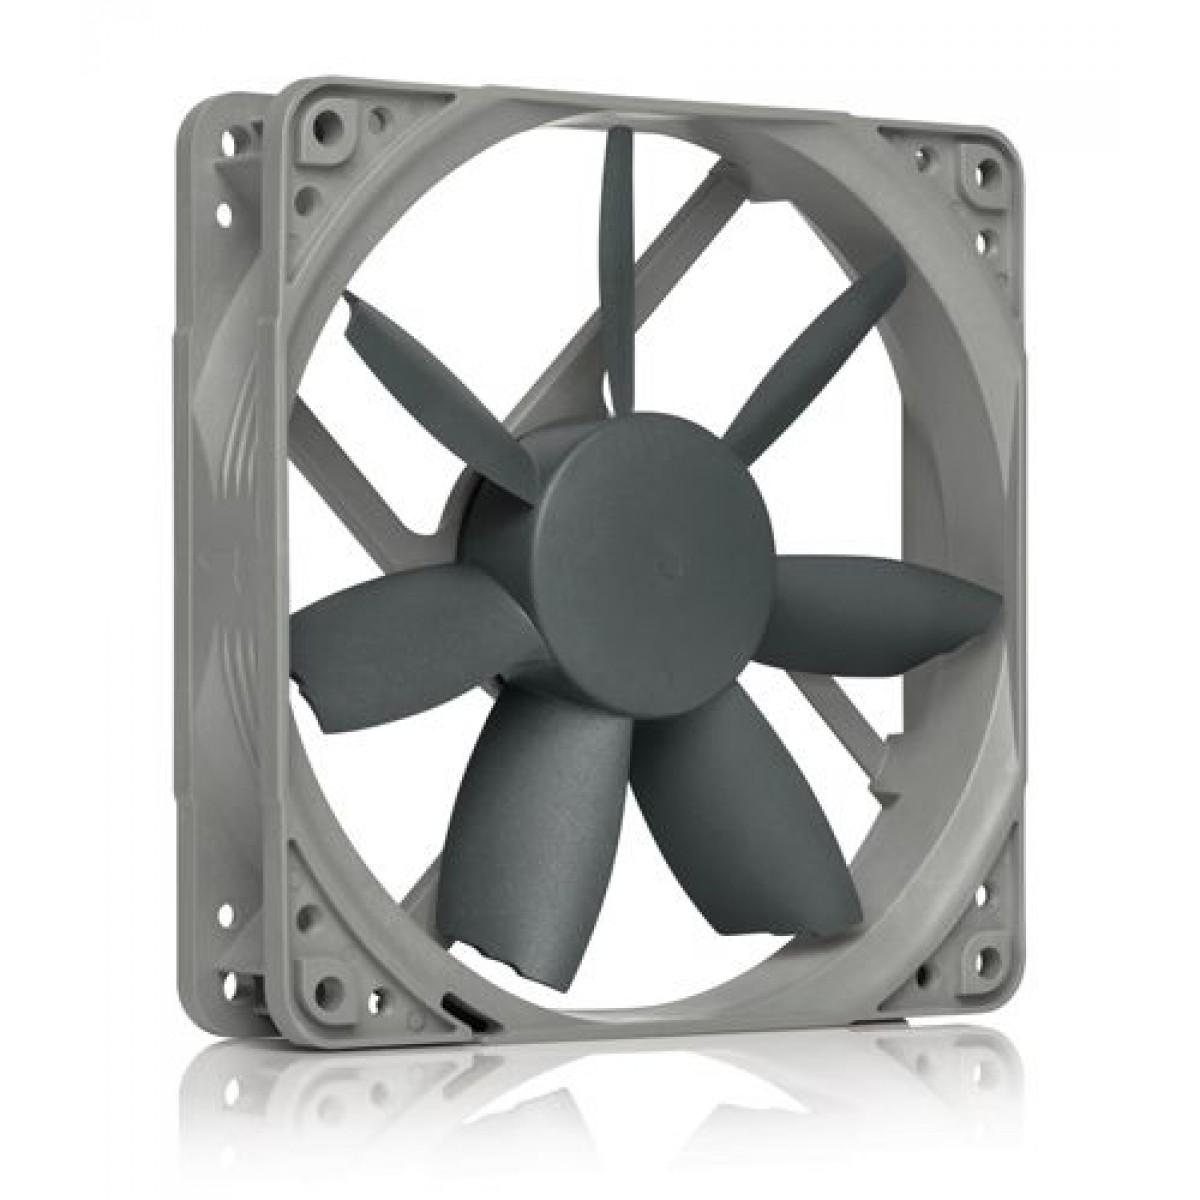 Cooler para Gabinete Noctua NF-S12B redux-1200, Gray, 120mm, NF-S12B redux-1200